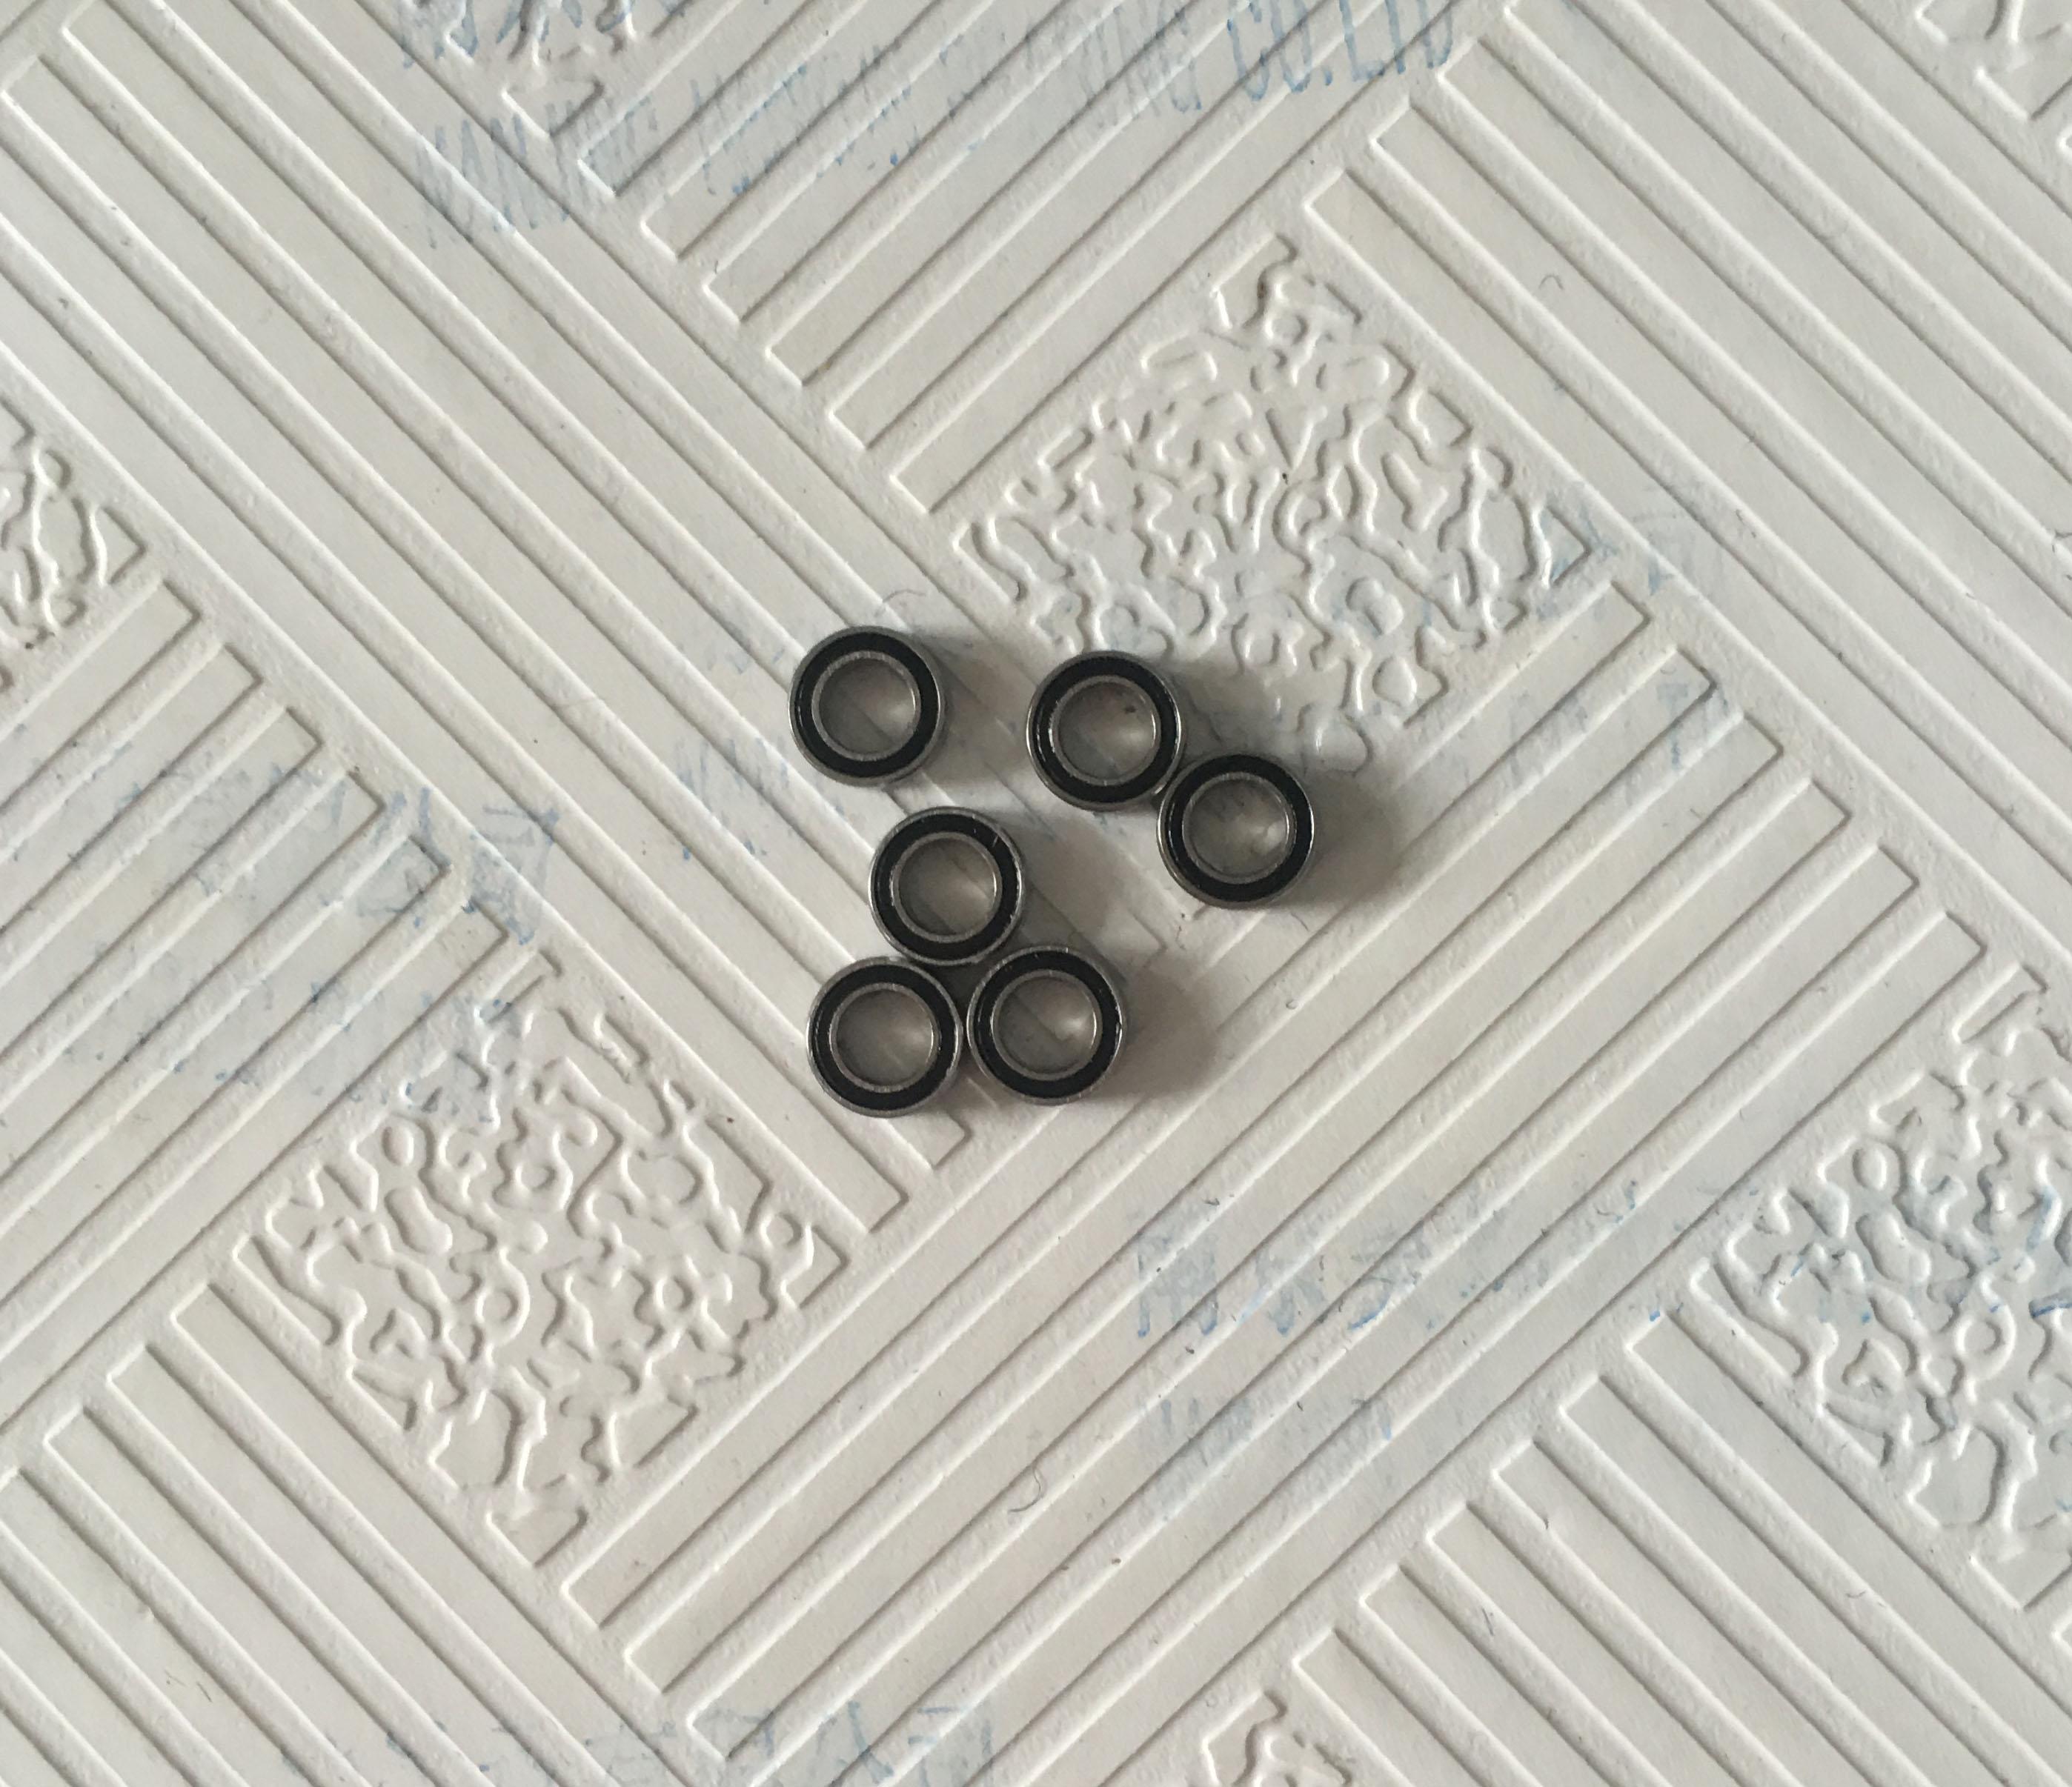 Free shipping 605-2RS 605 hybrid ceramic deep groove ball bearing 5x14x5mm 605 full si3n4 ceramic deep groove ball bearing 5x14x5mm